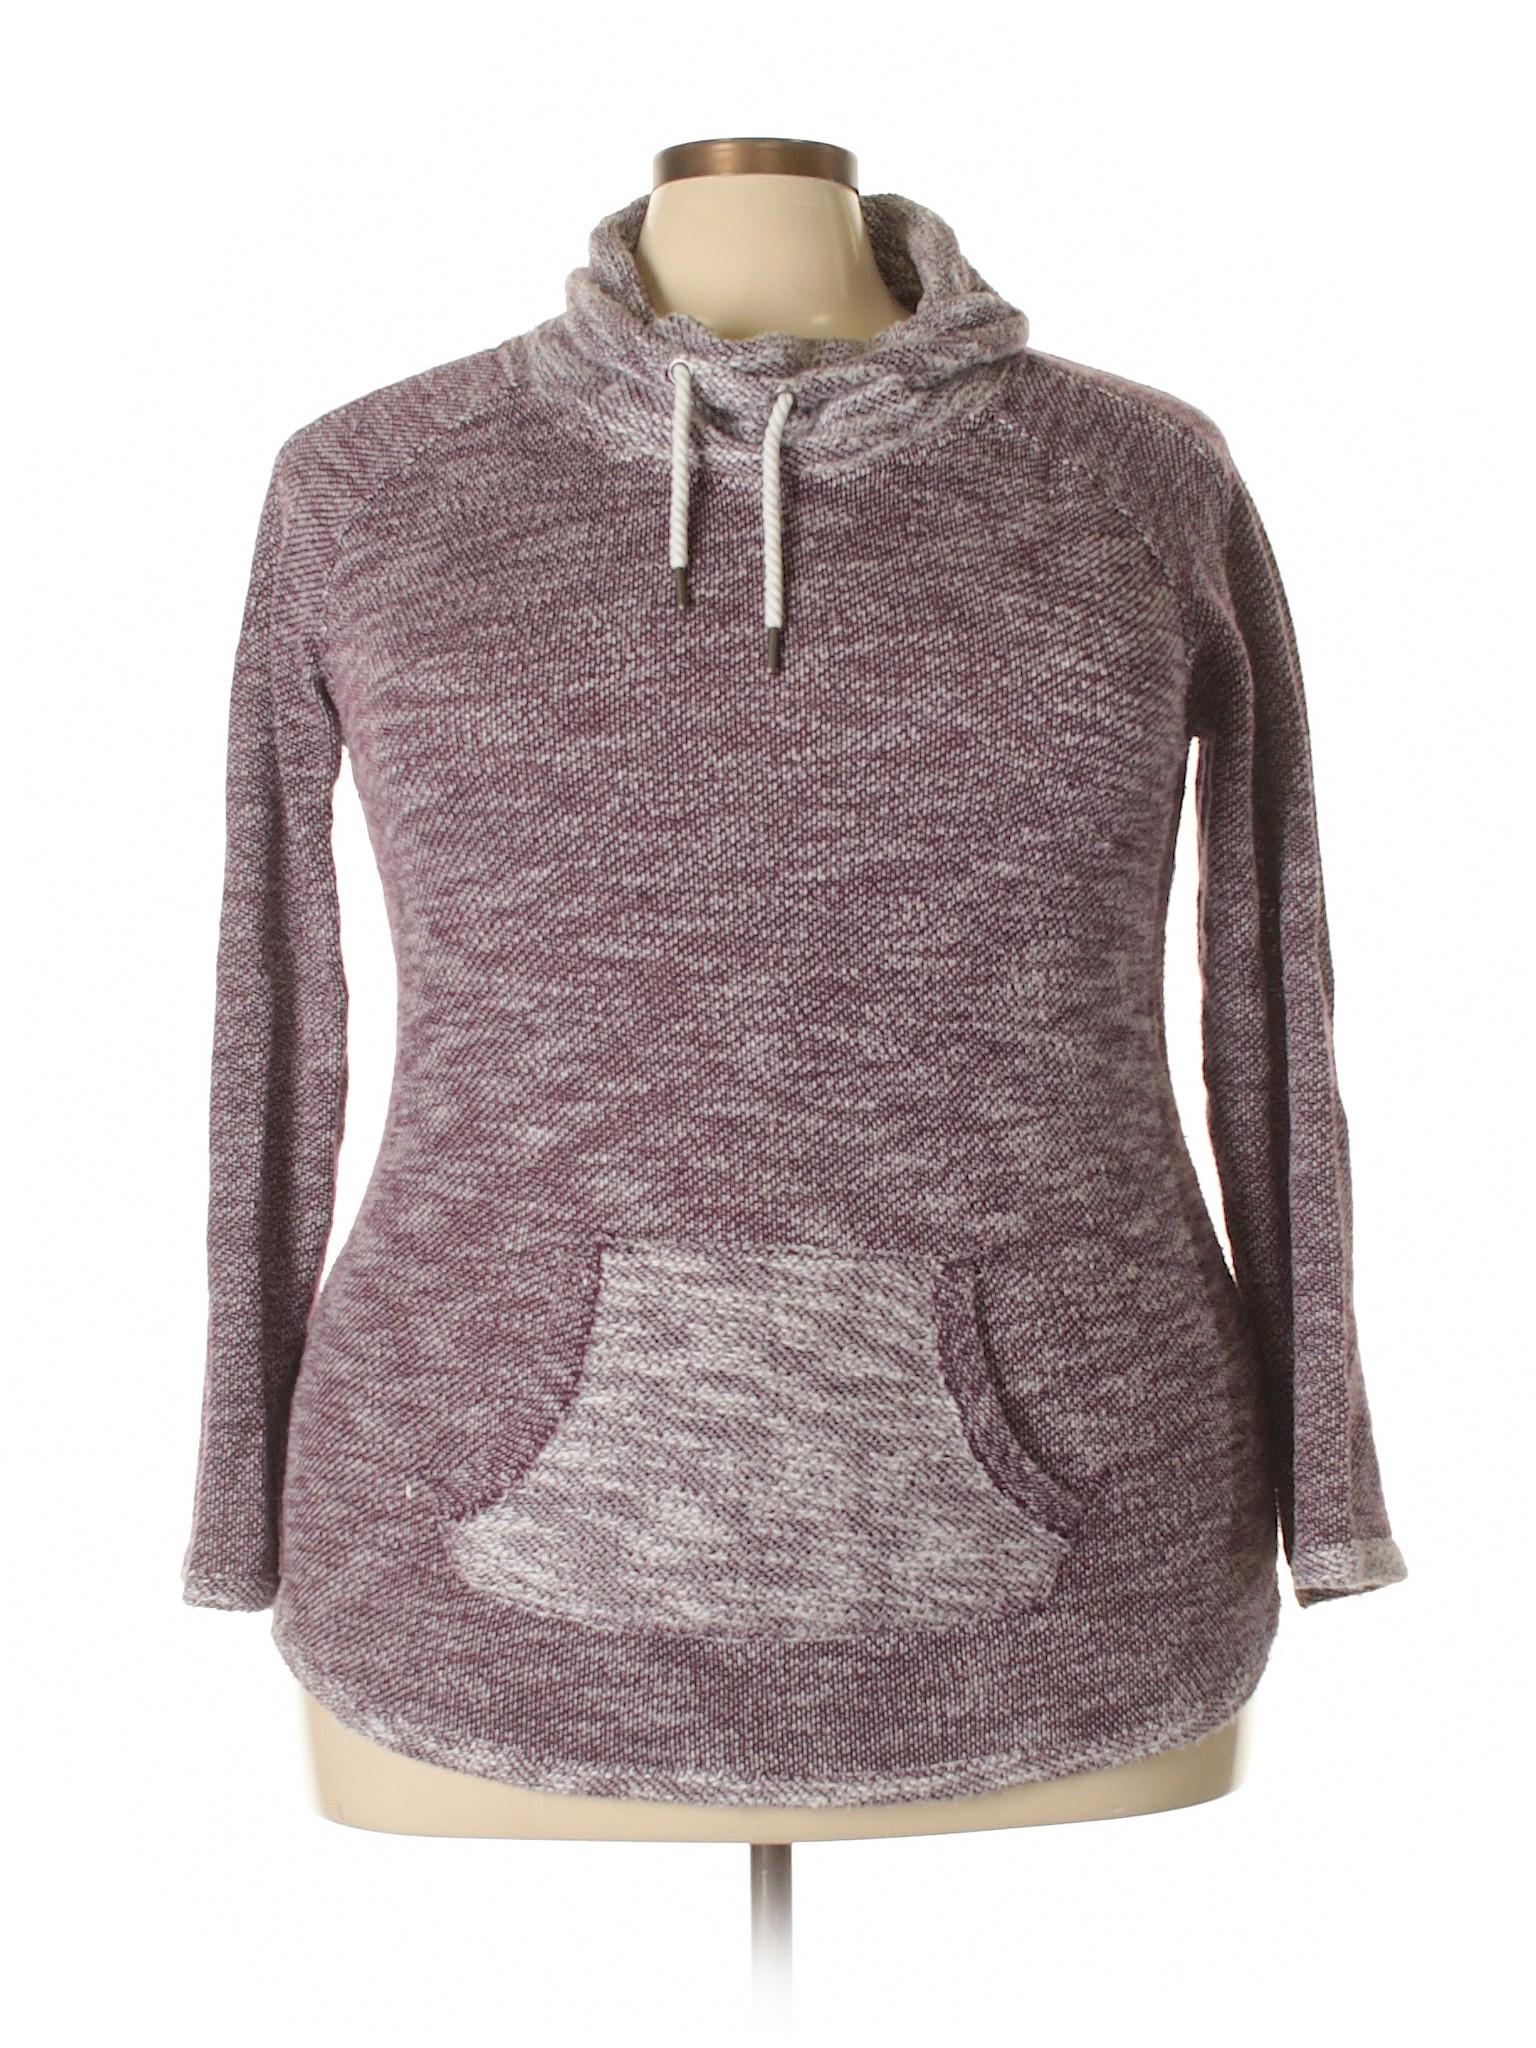 Boutique winter Pullover Boutique Pullover Sweater Boutique winter Sweater winter Pullover Kensie Kensie Kensie 8nAqwxUC